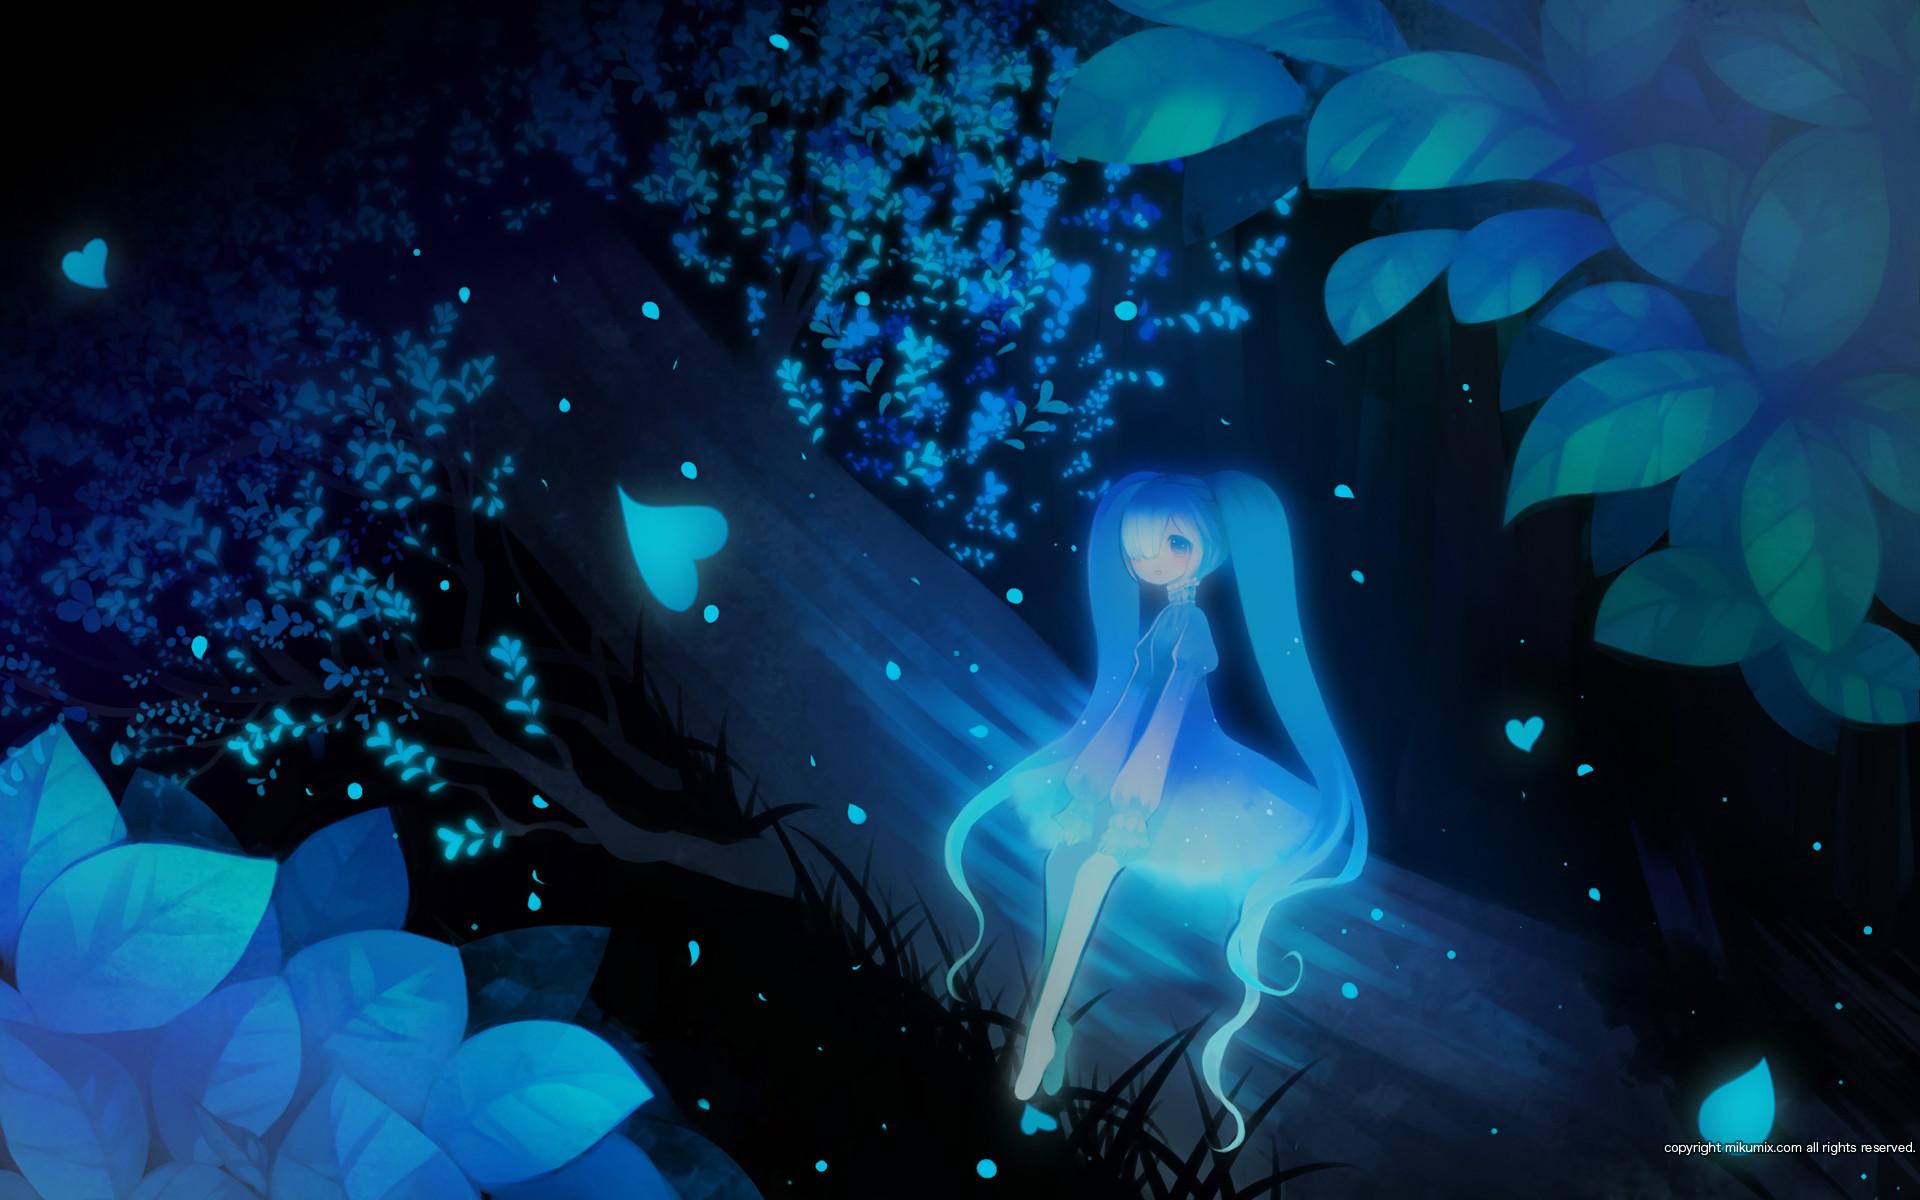 Dark fairy hatsune miku mikumix polychromatic puti devil tree twintails  vocaloid watermark wallpaper | | 76015 | WallpaperUP